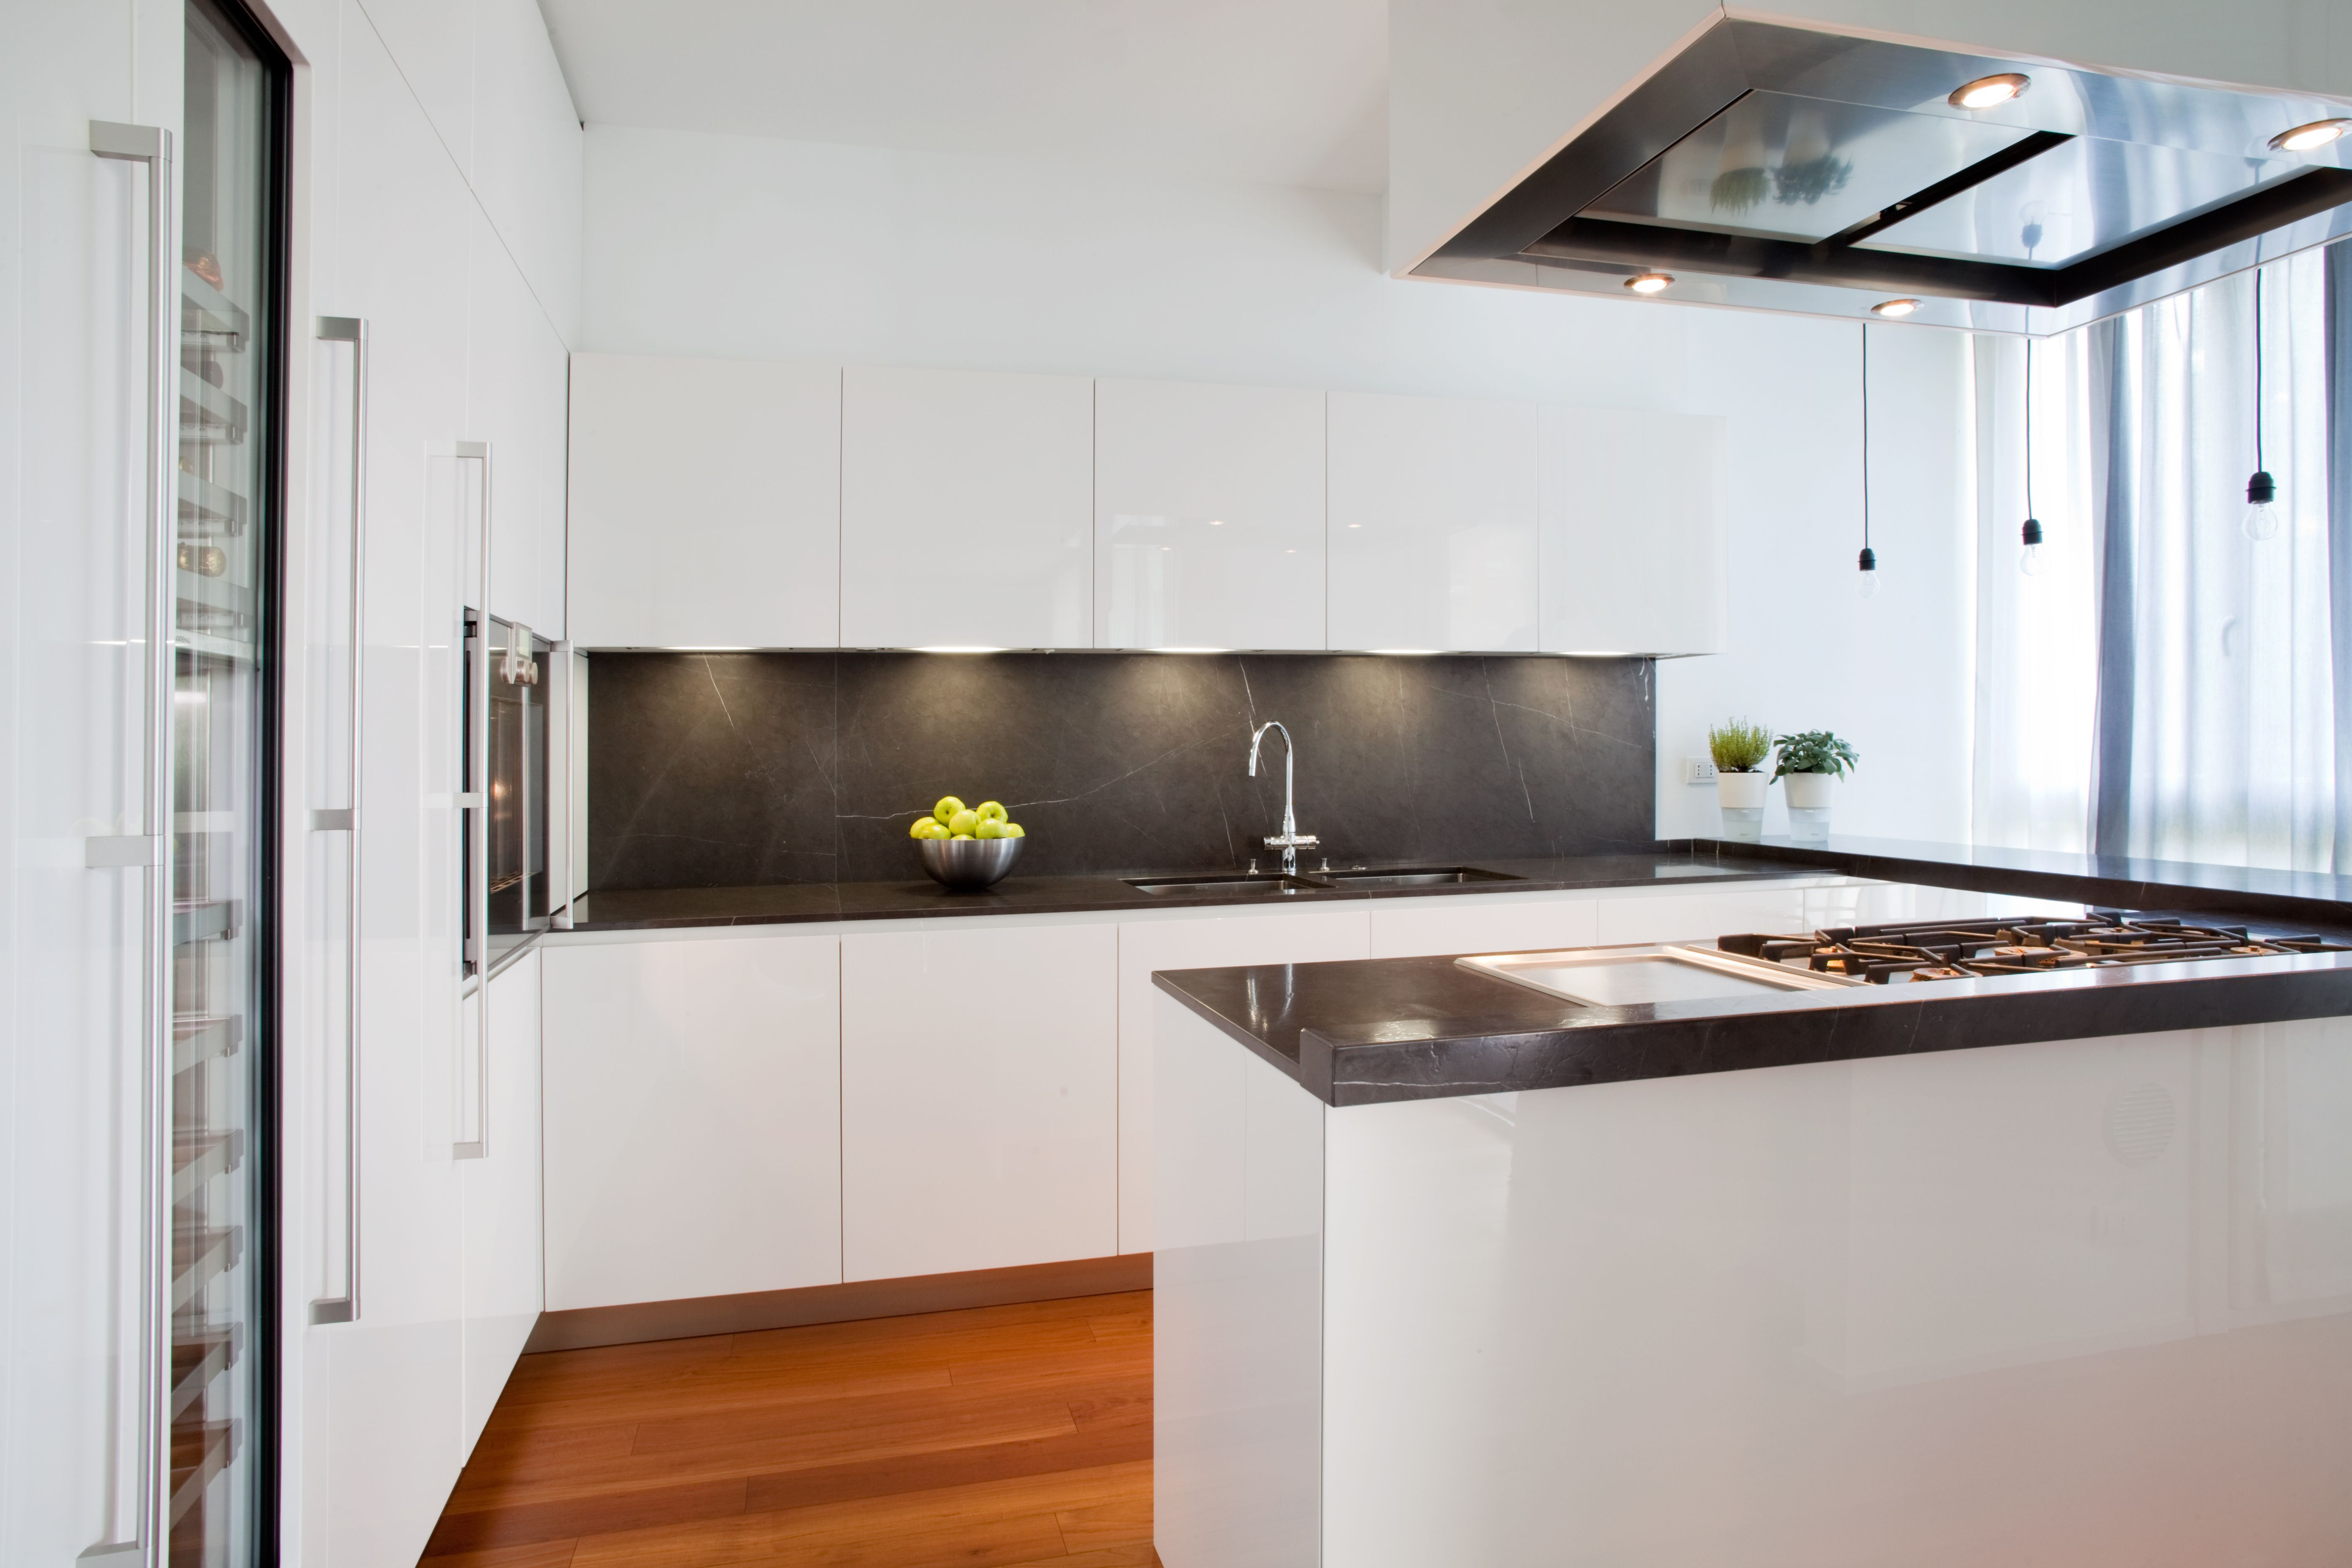 Cucina laccata lucida bianca con piano in stone grey ed - Cucina bianca lucida ...